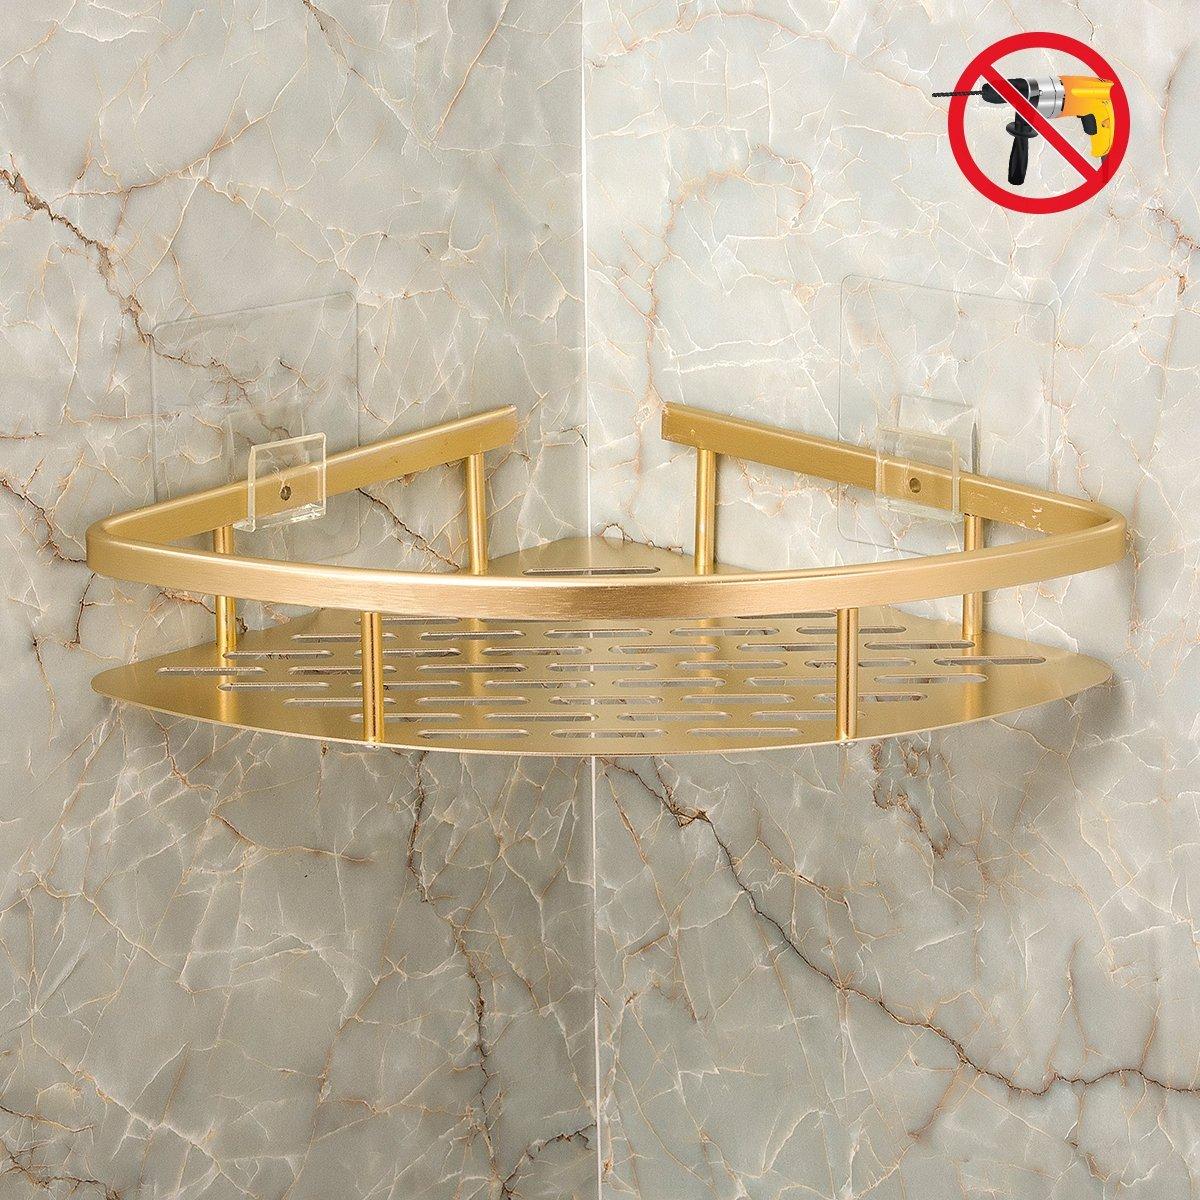 Bearstar 2-Pack Triangle Aluminum Bathroom Show Shelf,No Drilling Polished Golden